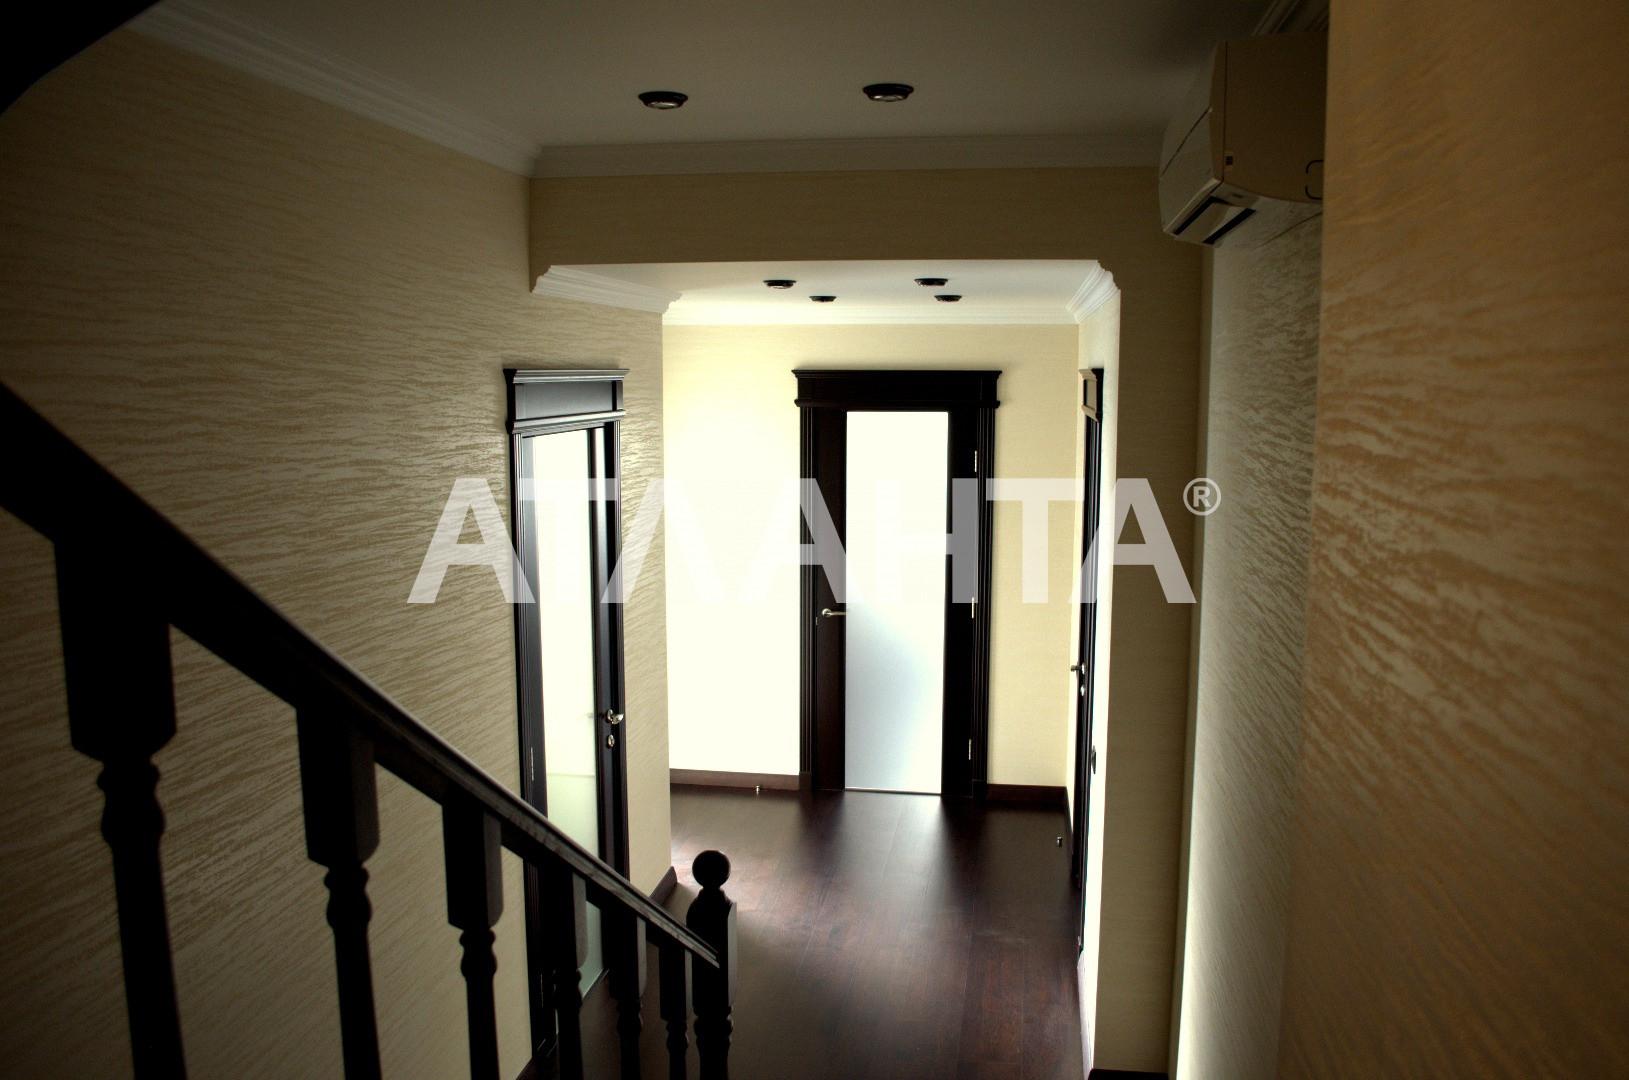 Продается 4-комнатная Квартира на ул. Французский Бул. (Пролетарский Бул.) — 350 000 у.е. (фото №17)